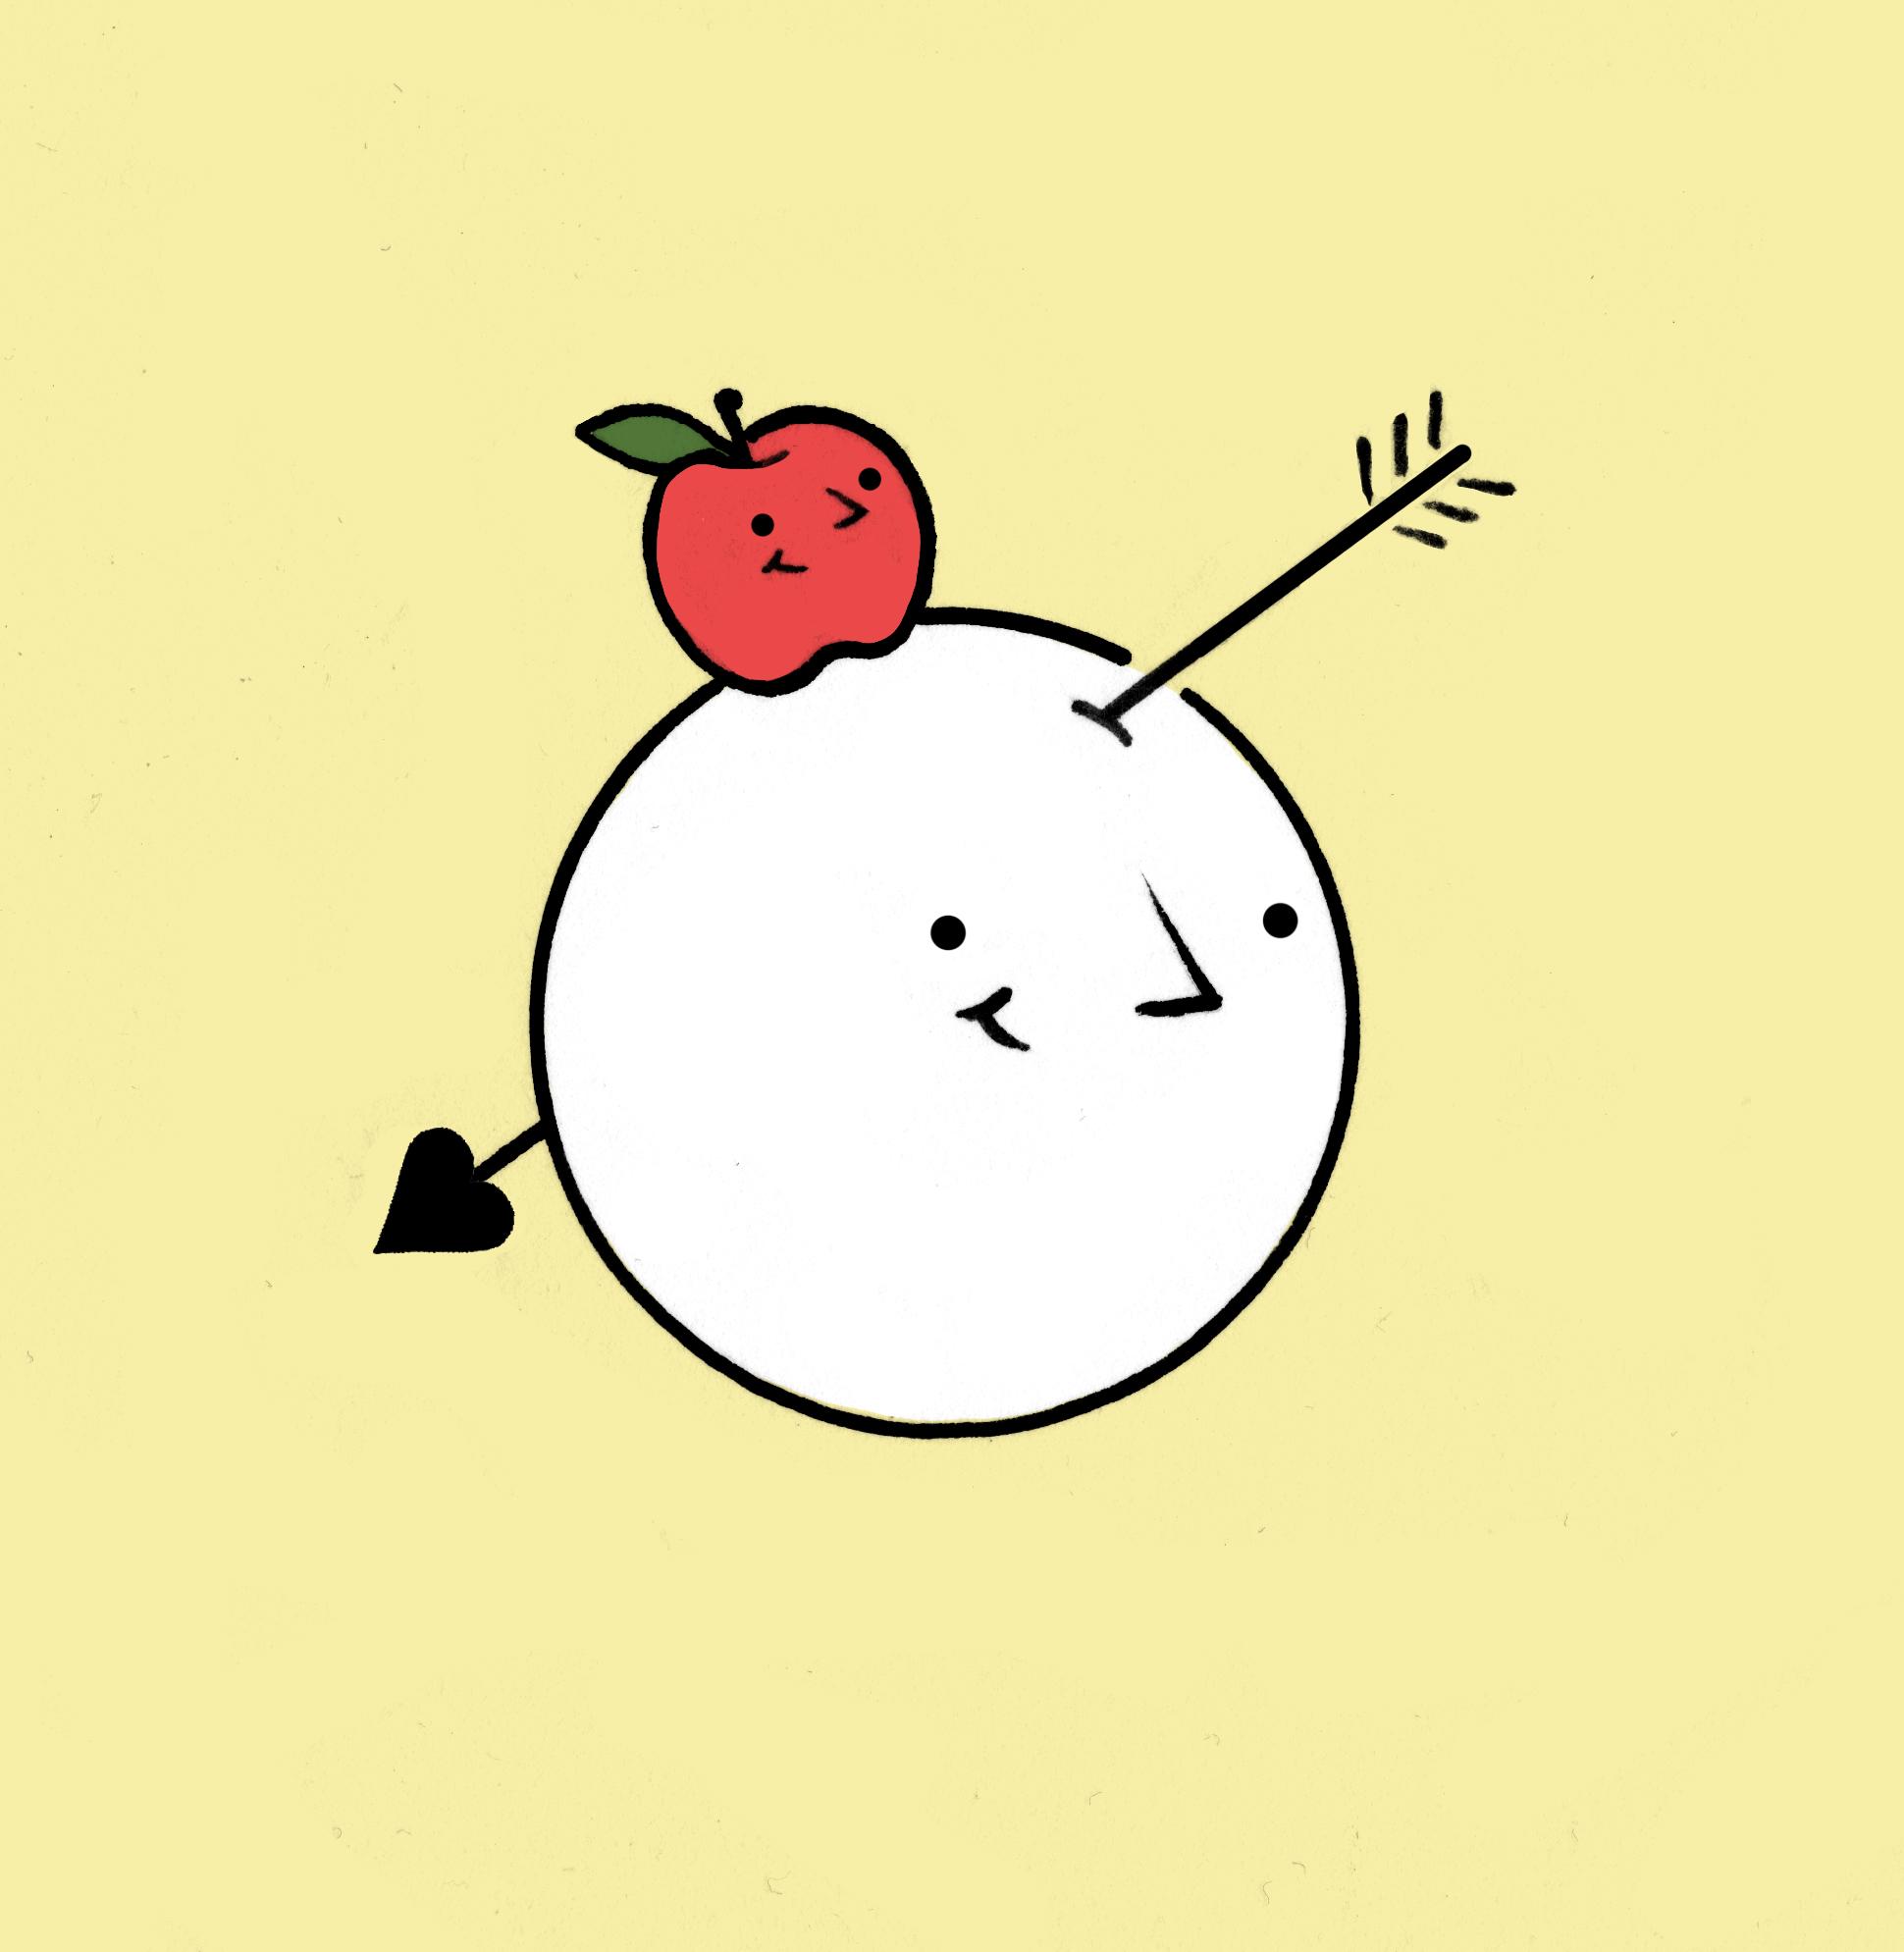 cuteapple.jpg